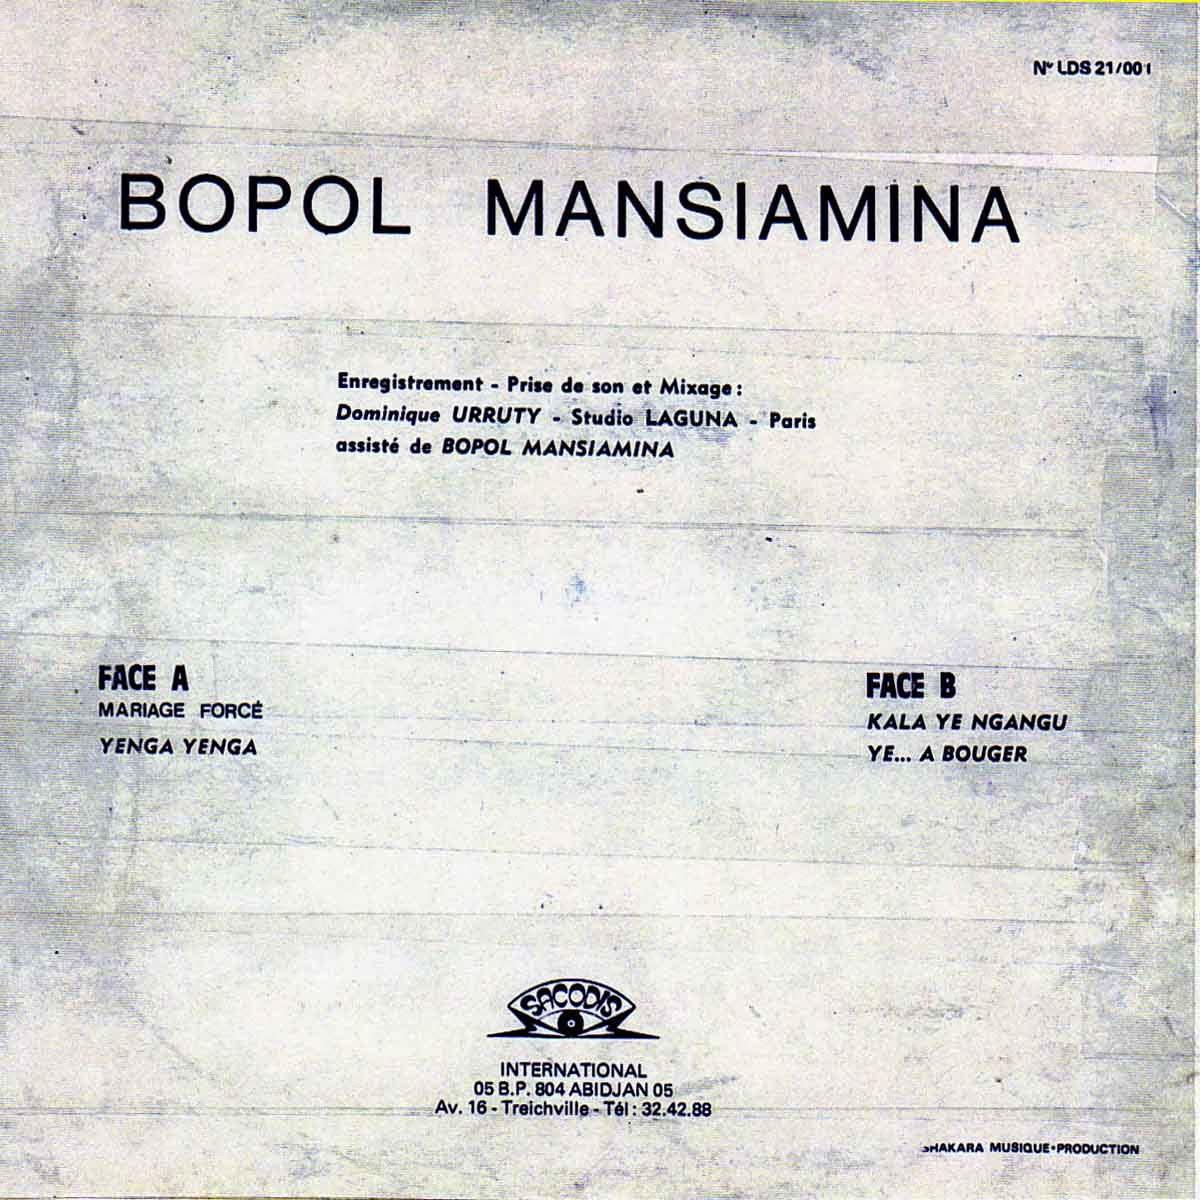 Bopol Mansiamina Besisimou Maillot Jaune